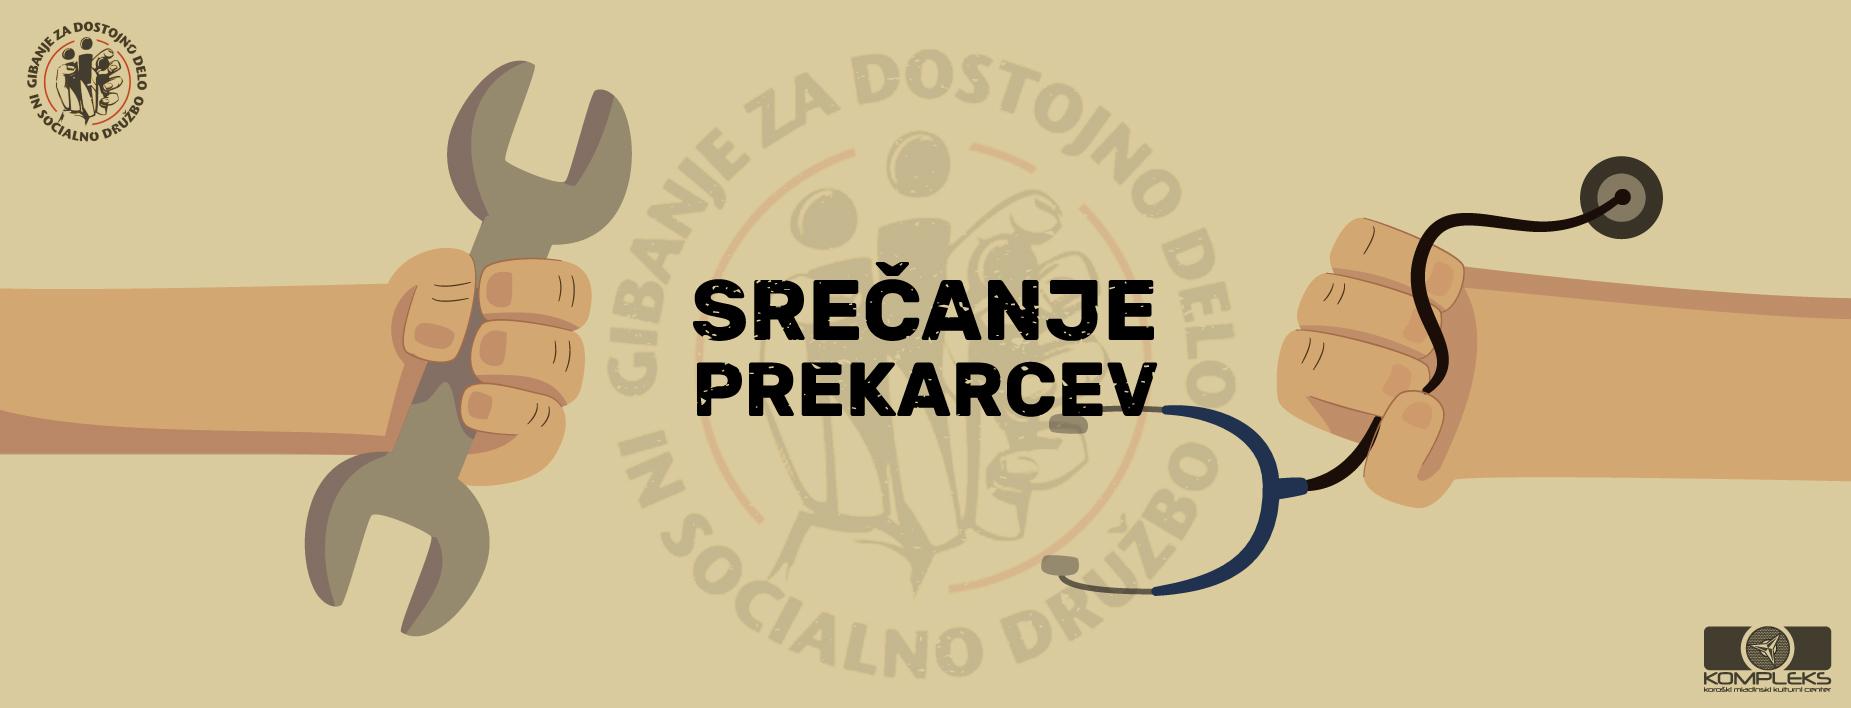 prekarci-01-copy